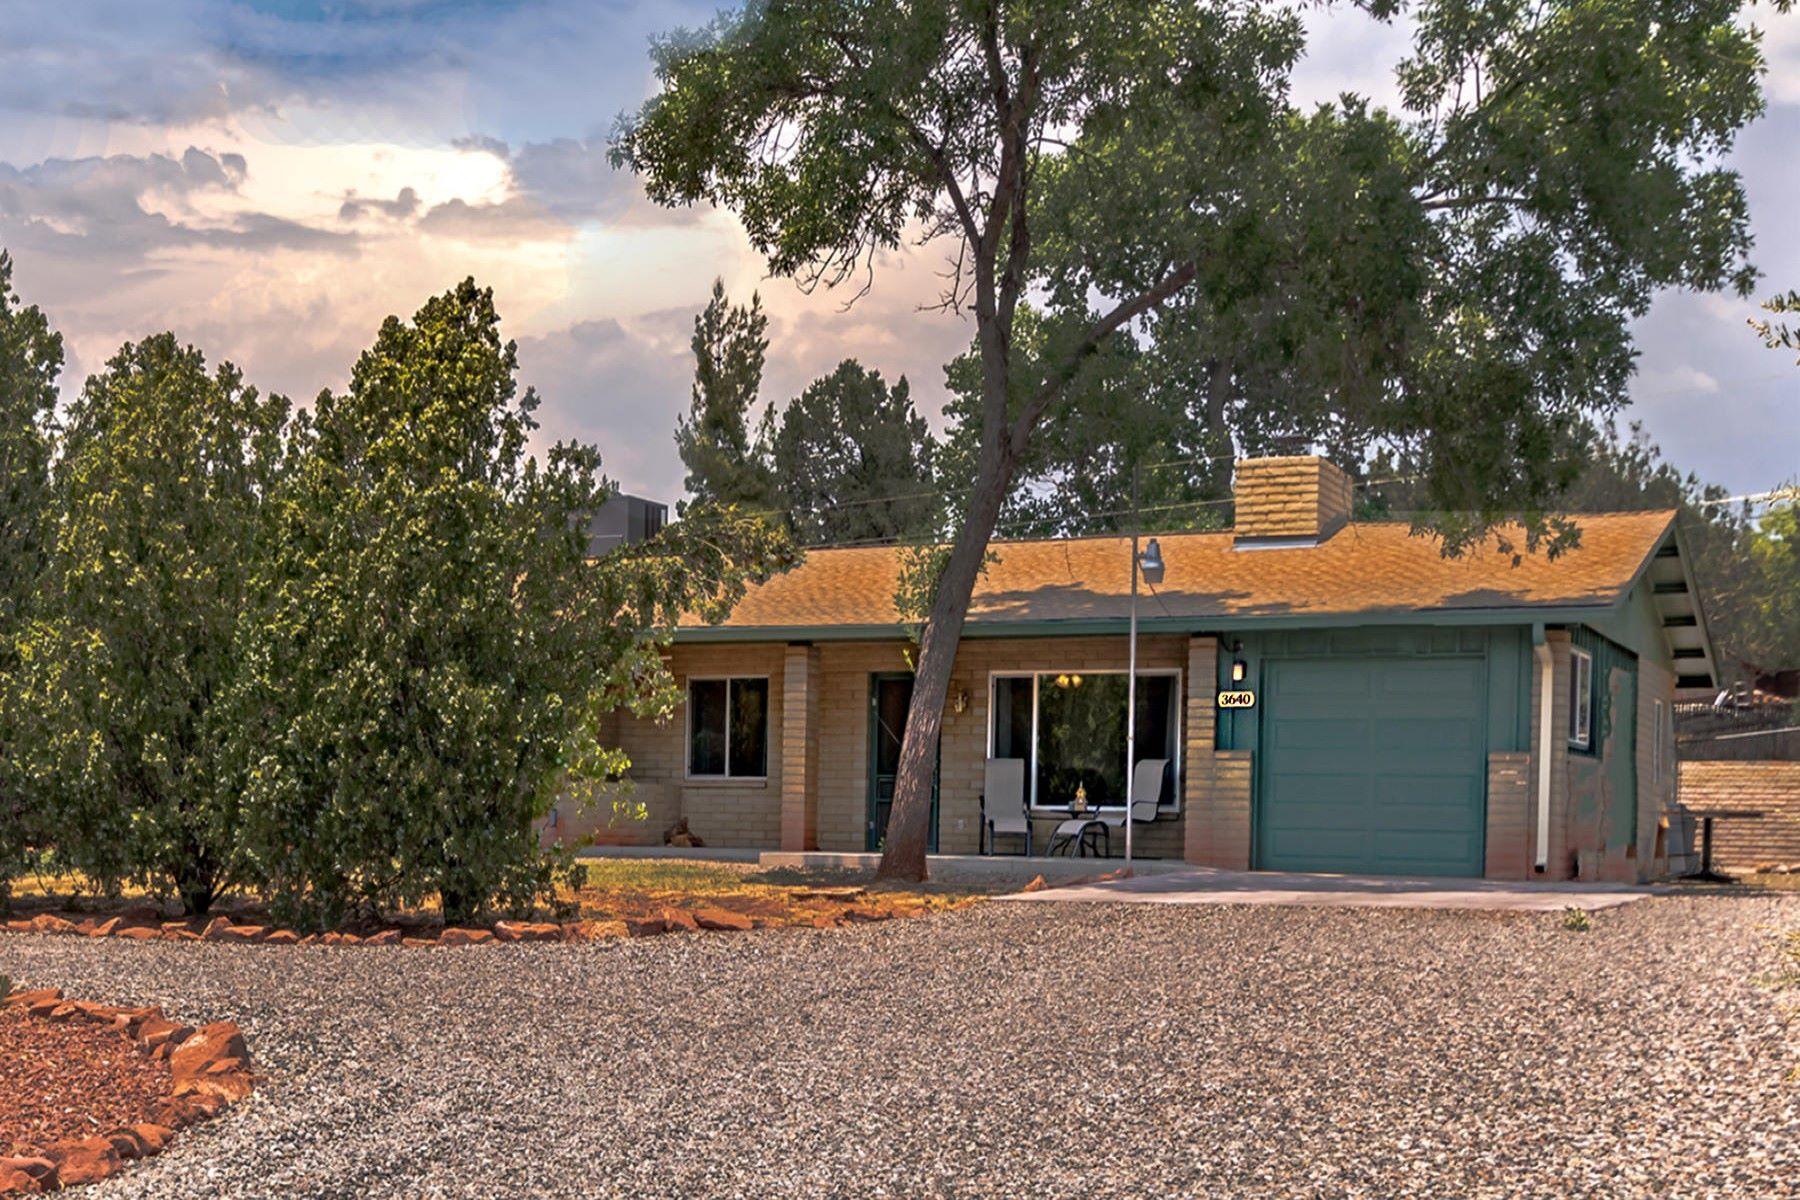 Single Family Home for Sale at Lovely single level home in Sedona 3640 Moki Drive Sedona, Arizona, 86336 United States